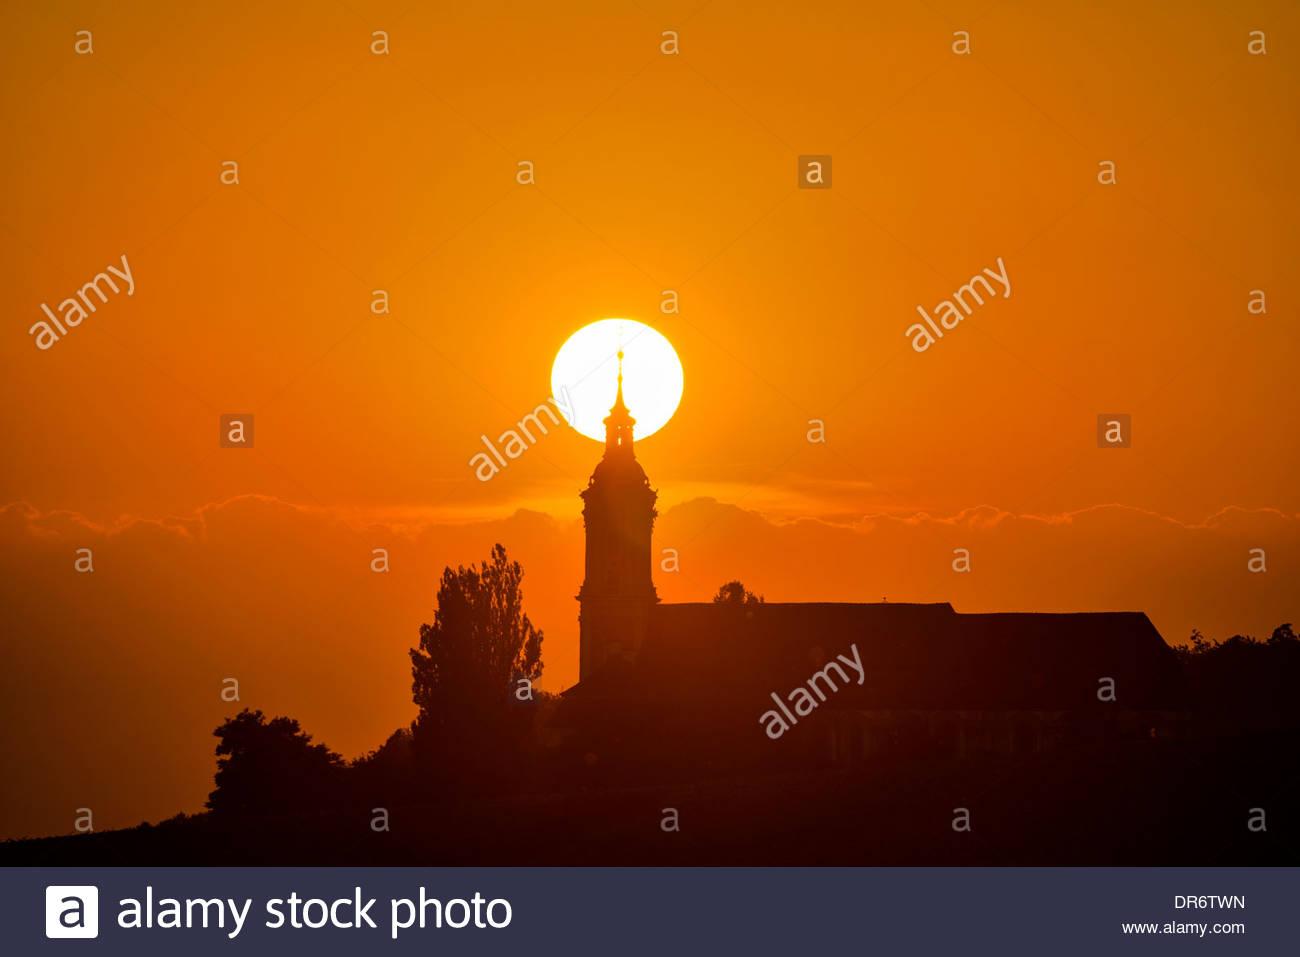 Germany, Baden-Wurttemberg, Birnau, Baroque church at sunset - Stock Image